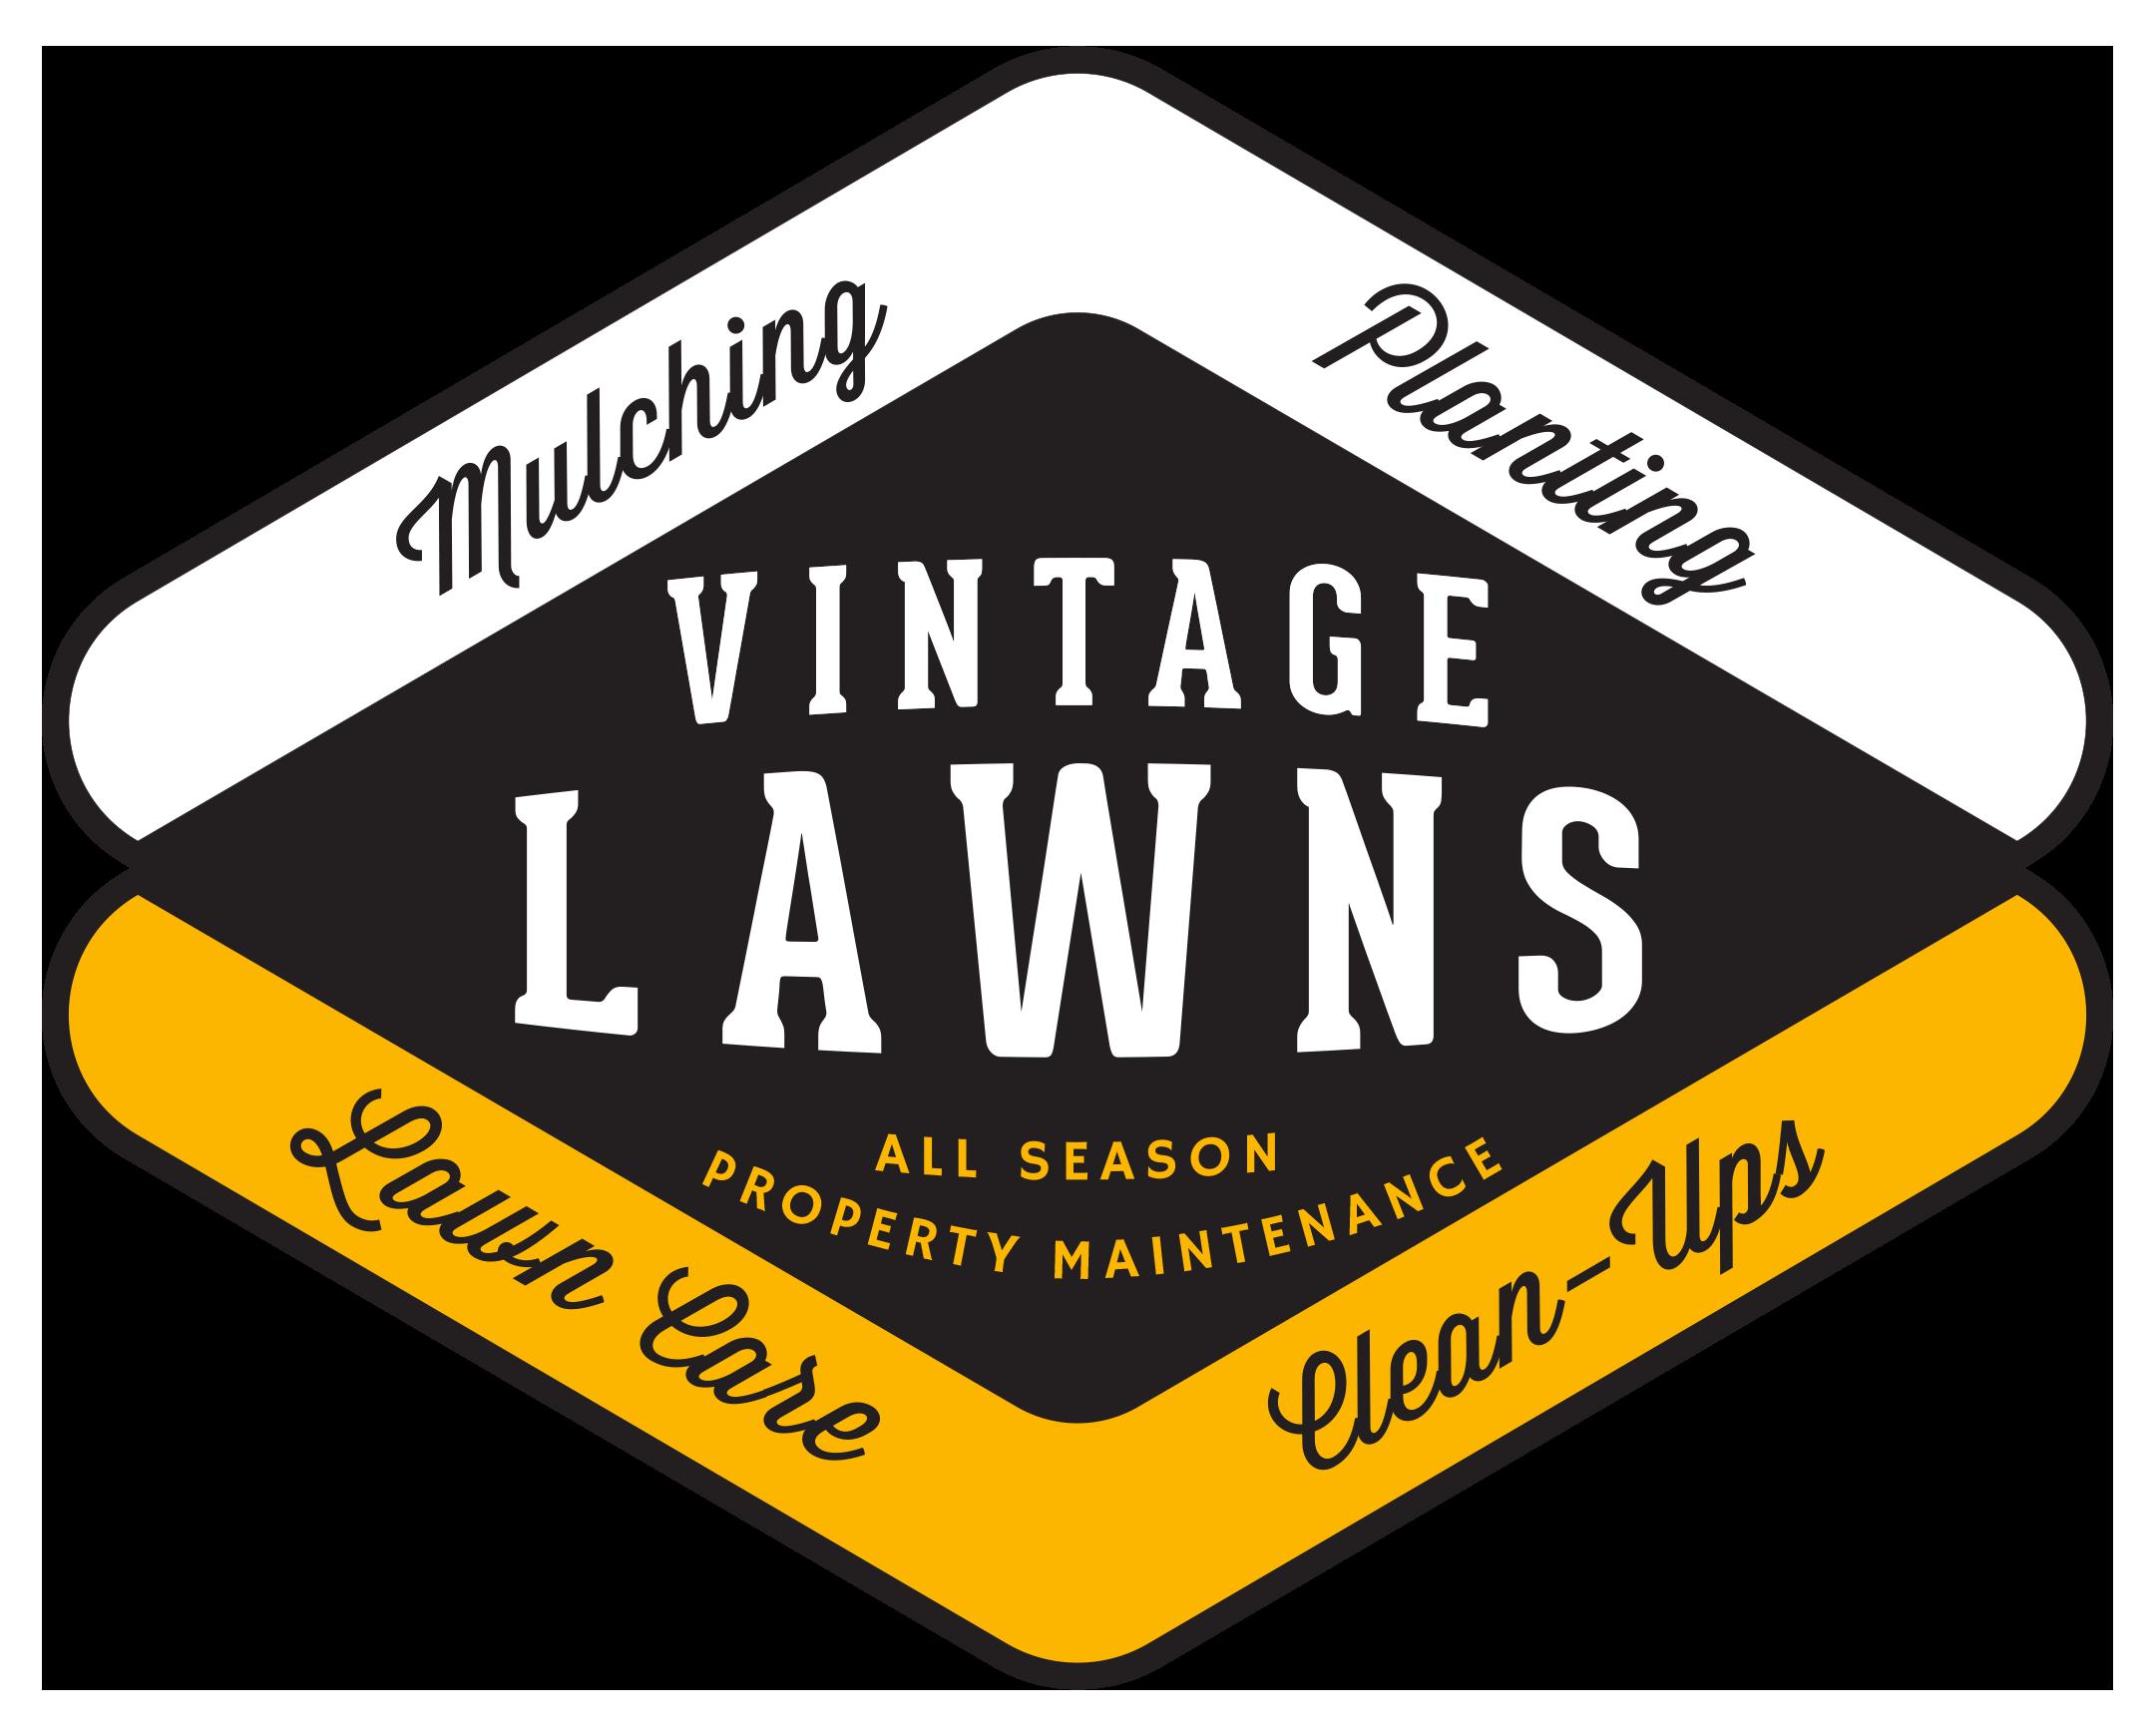 No Background Vintage Lawns